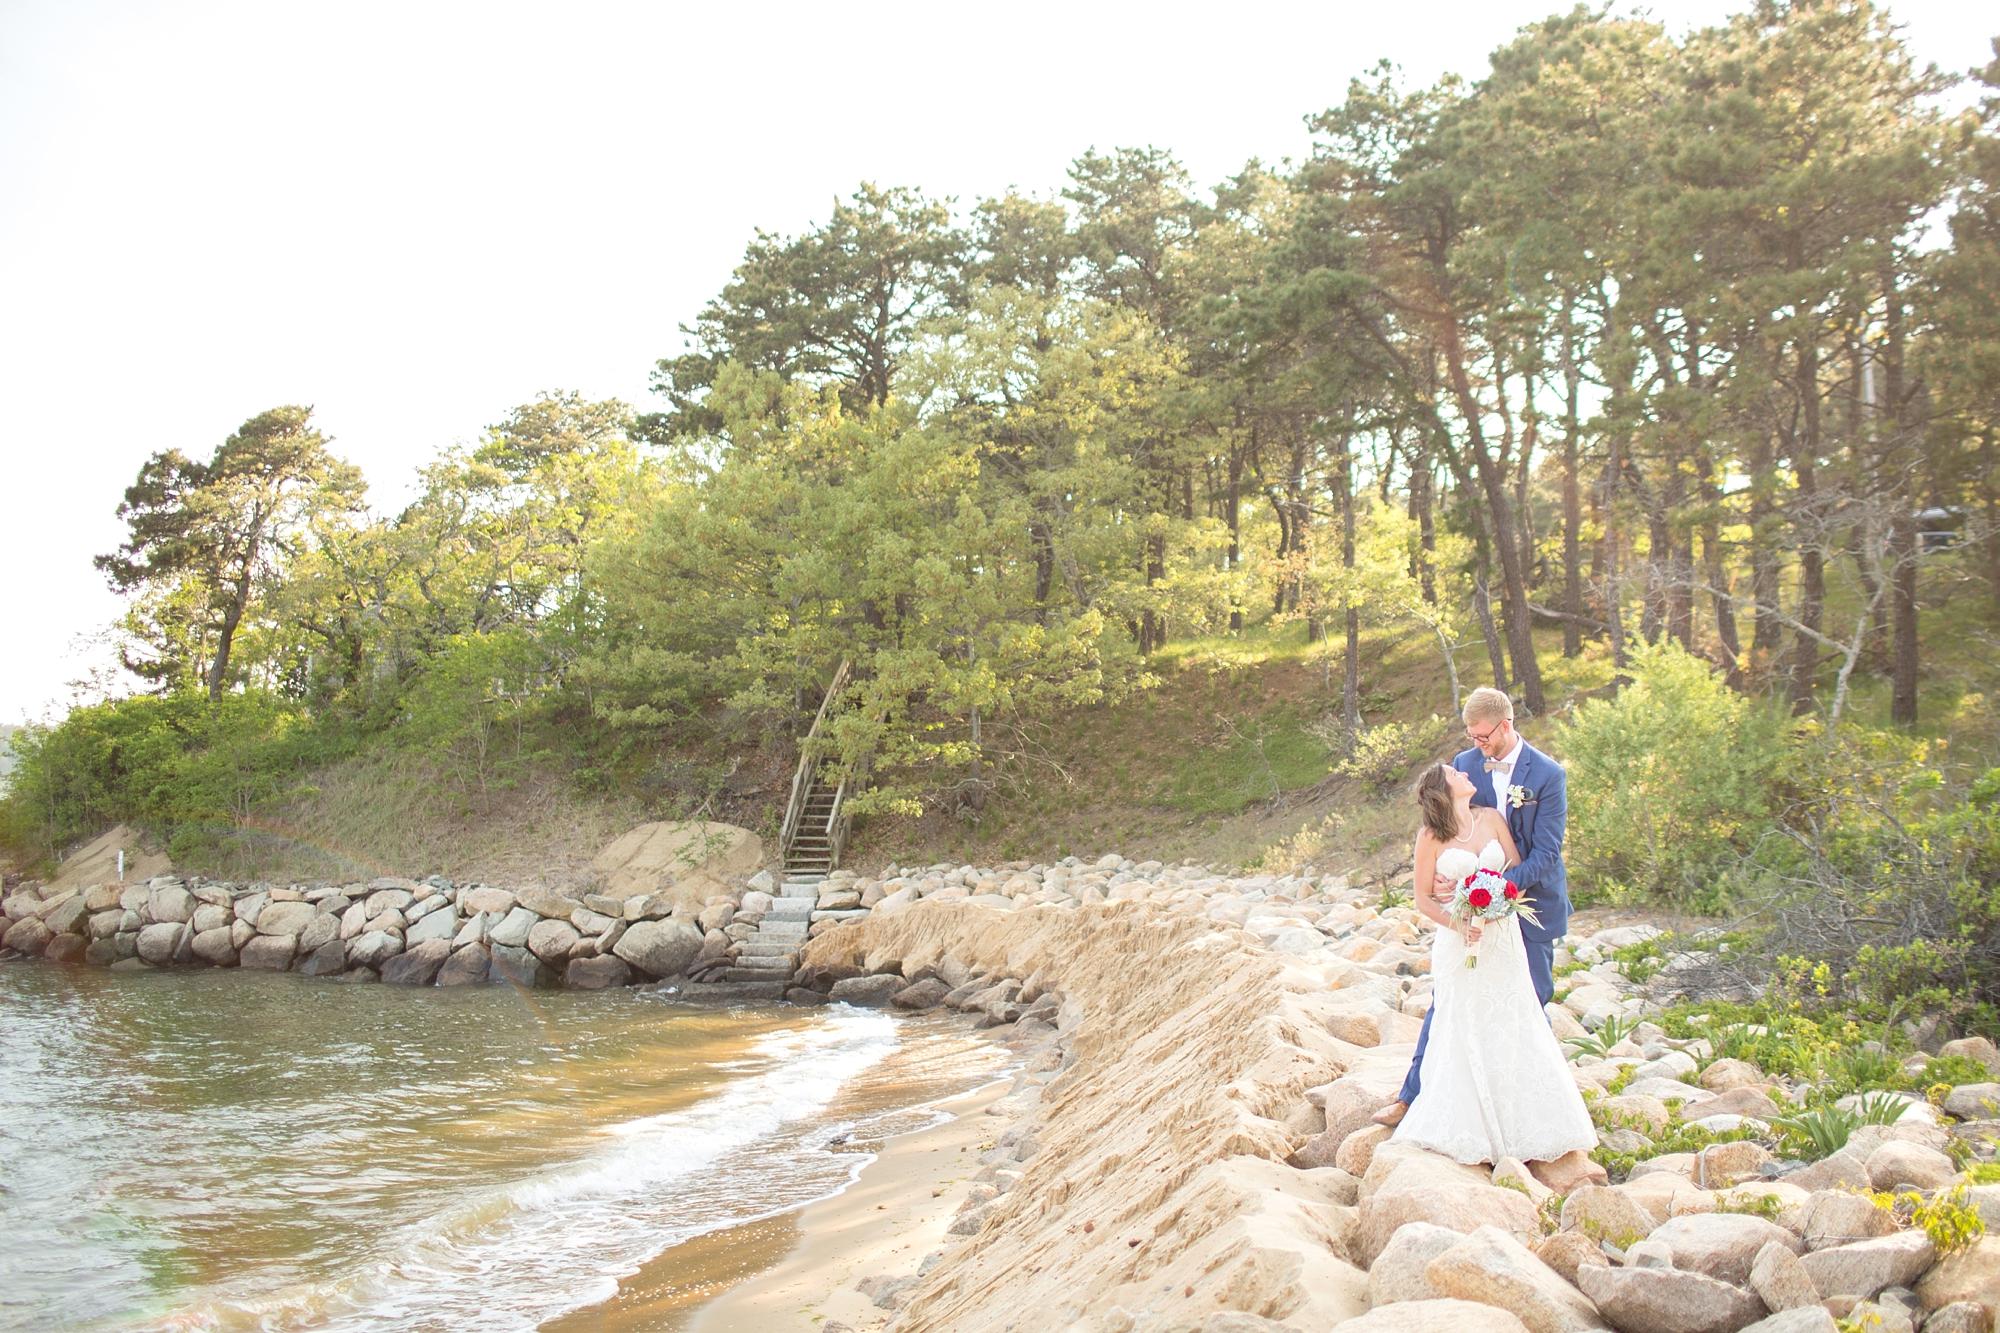 Goodman 3-Bride & Groom Portraits-811_anna grace photography wellfleet cape cod massachusetts destination wedding photographer Chequessett Yacht and Country Club wedding photo.jpg